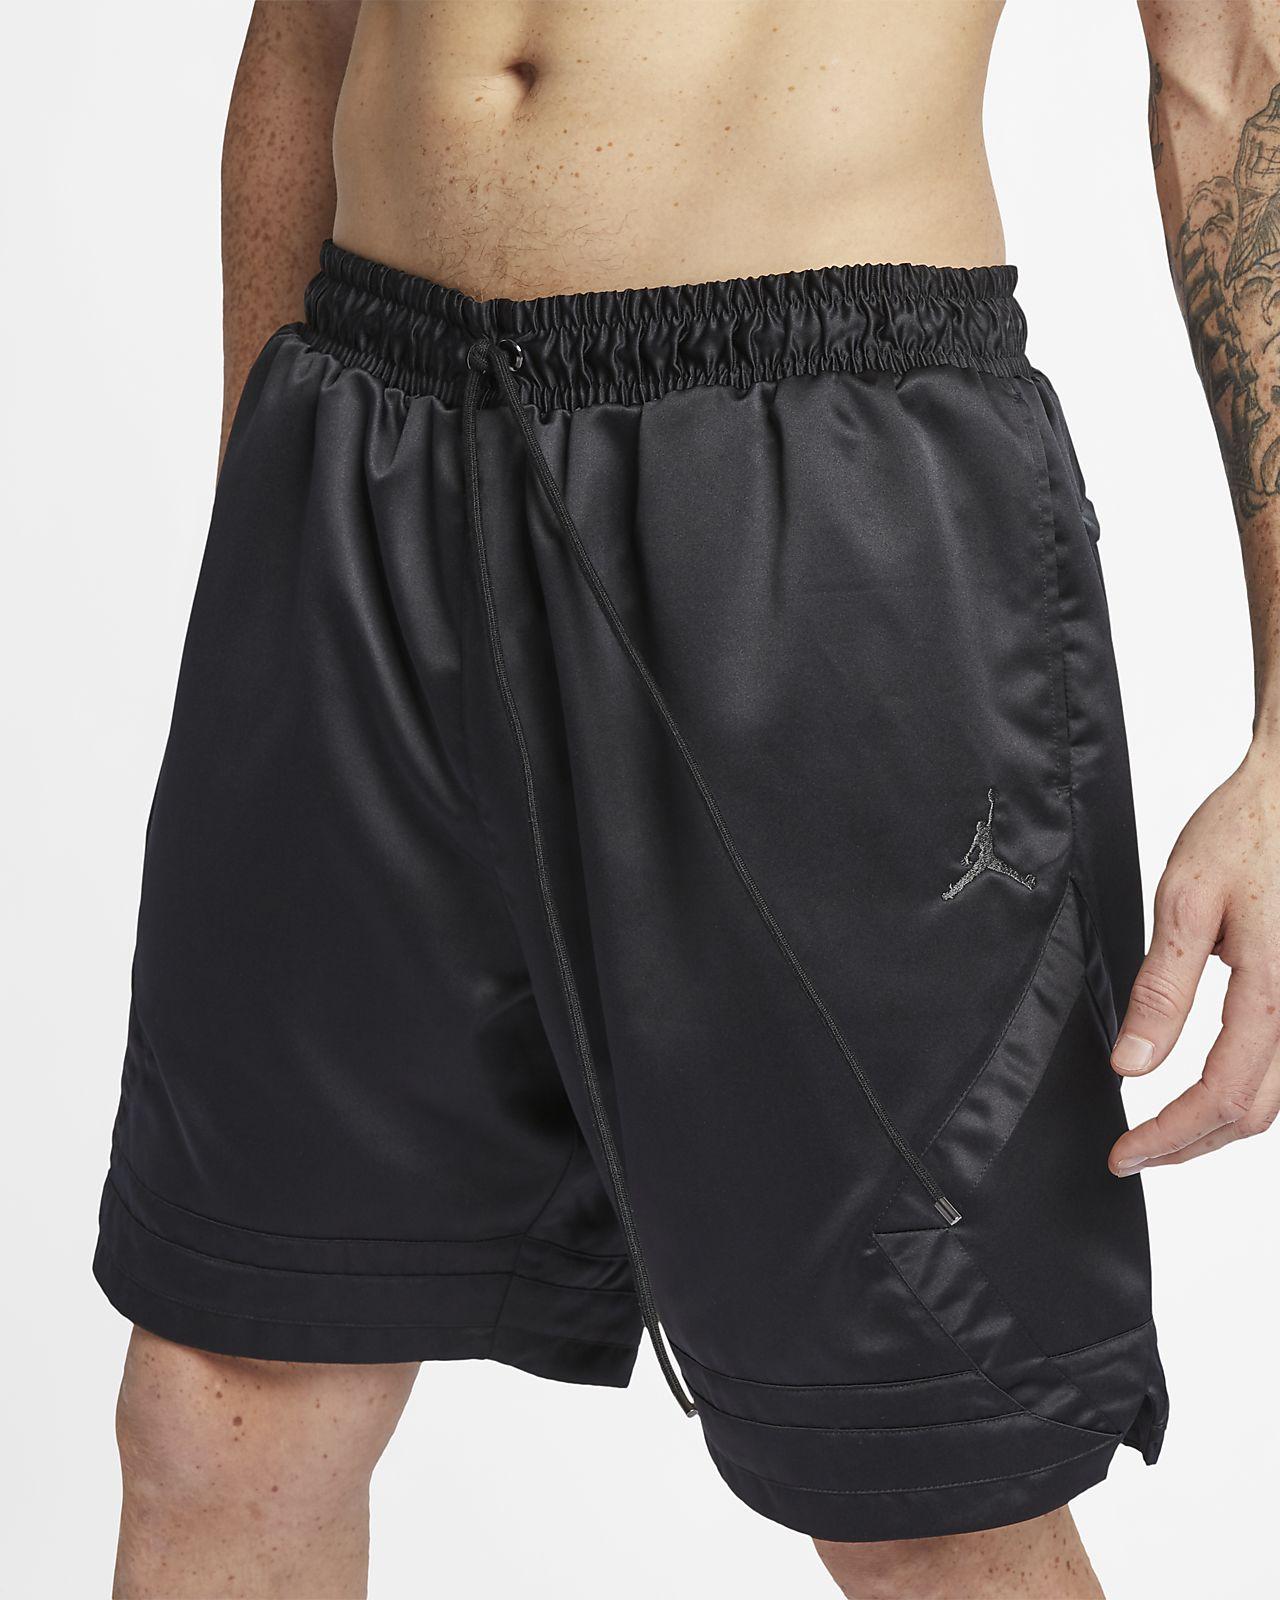 7a08da61050352 Low Resolution Jordan Satin Diamond Men s Shorts Jordan Satin Diamond Men s  Shorts